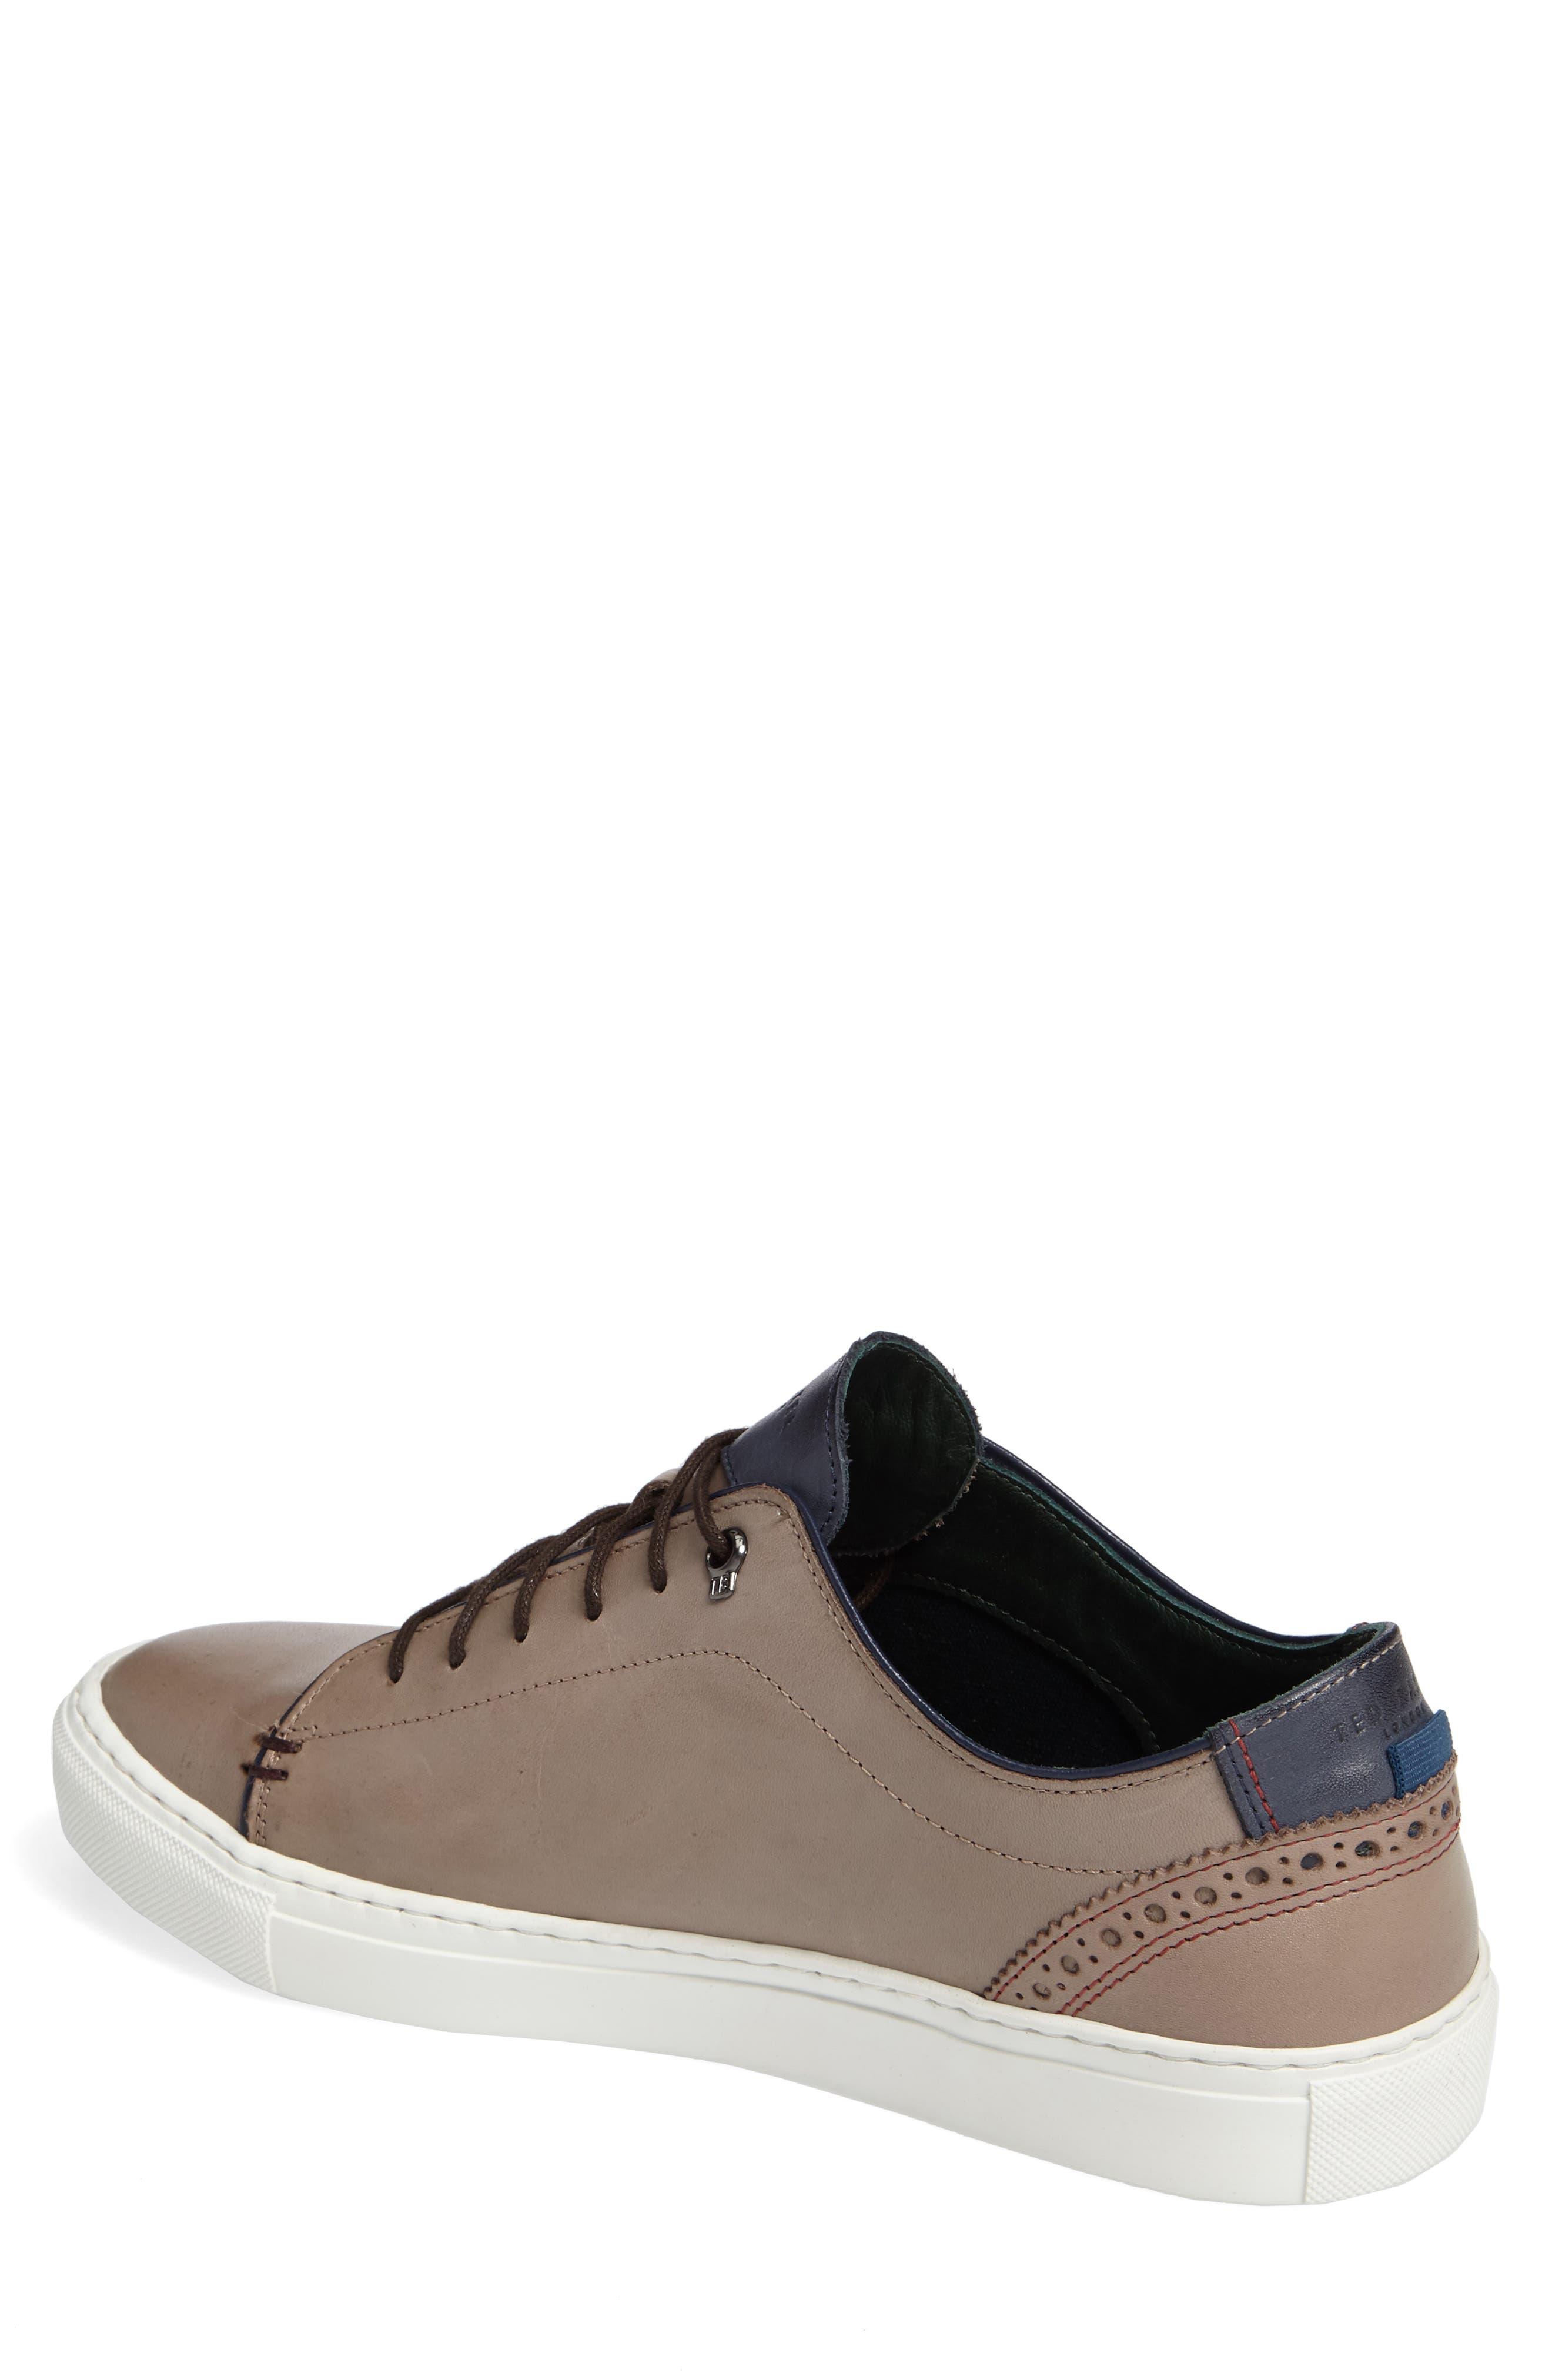 'Kiing Classic' Sneaker,                             Alternate thumbnail 20, color,